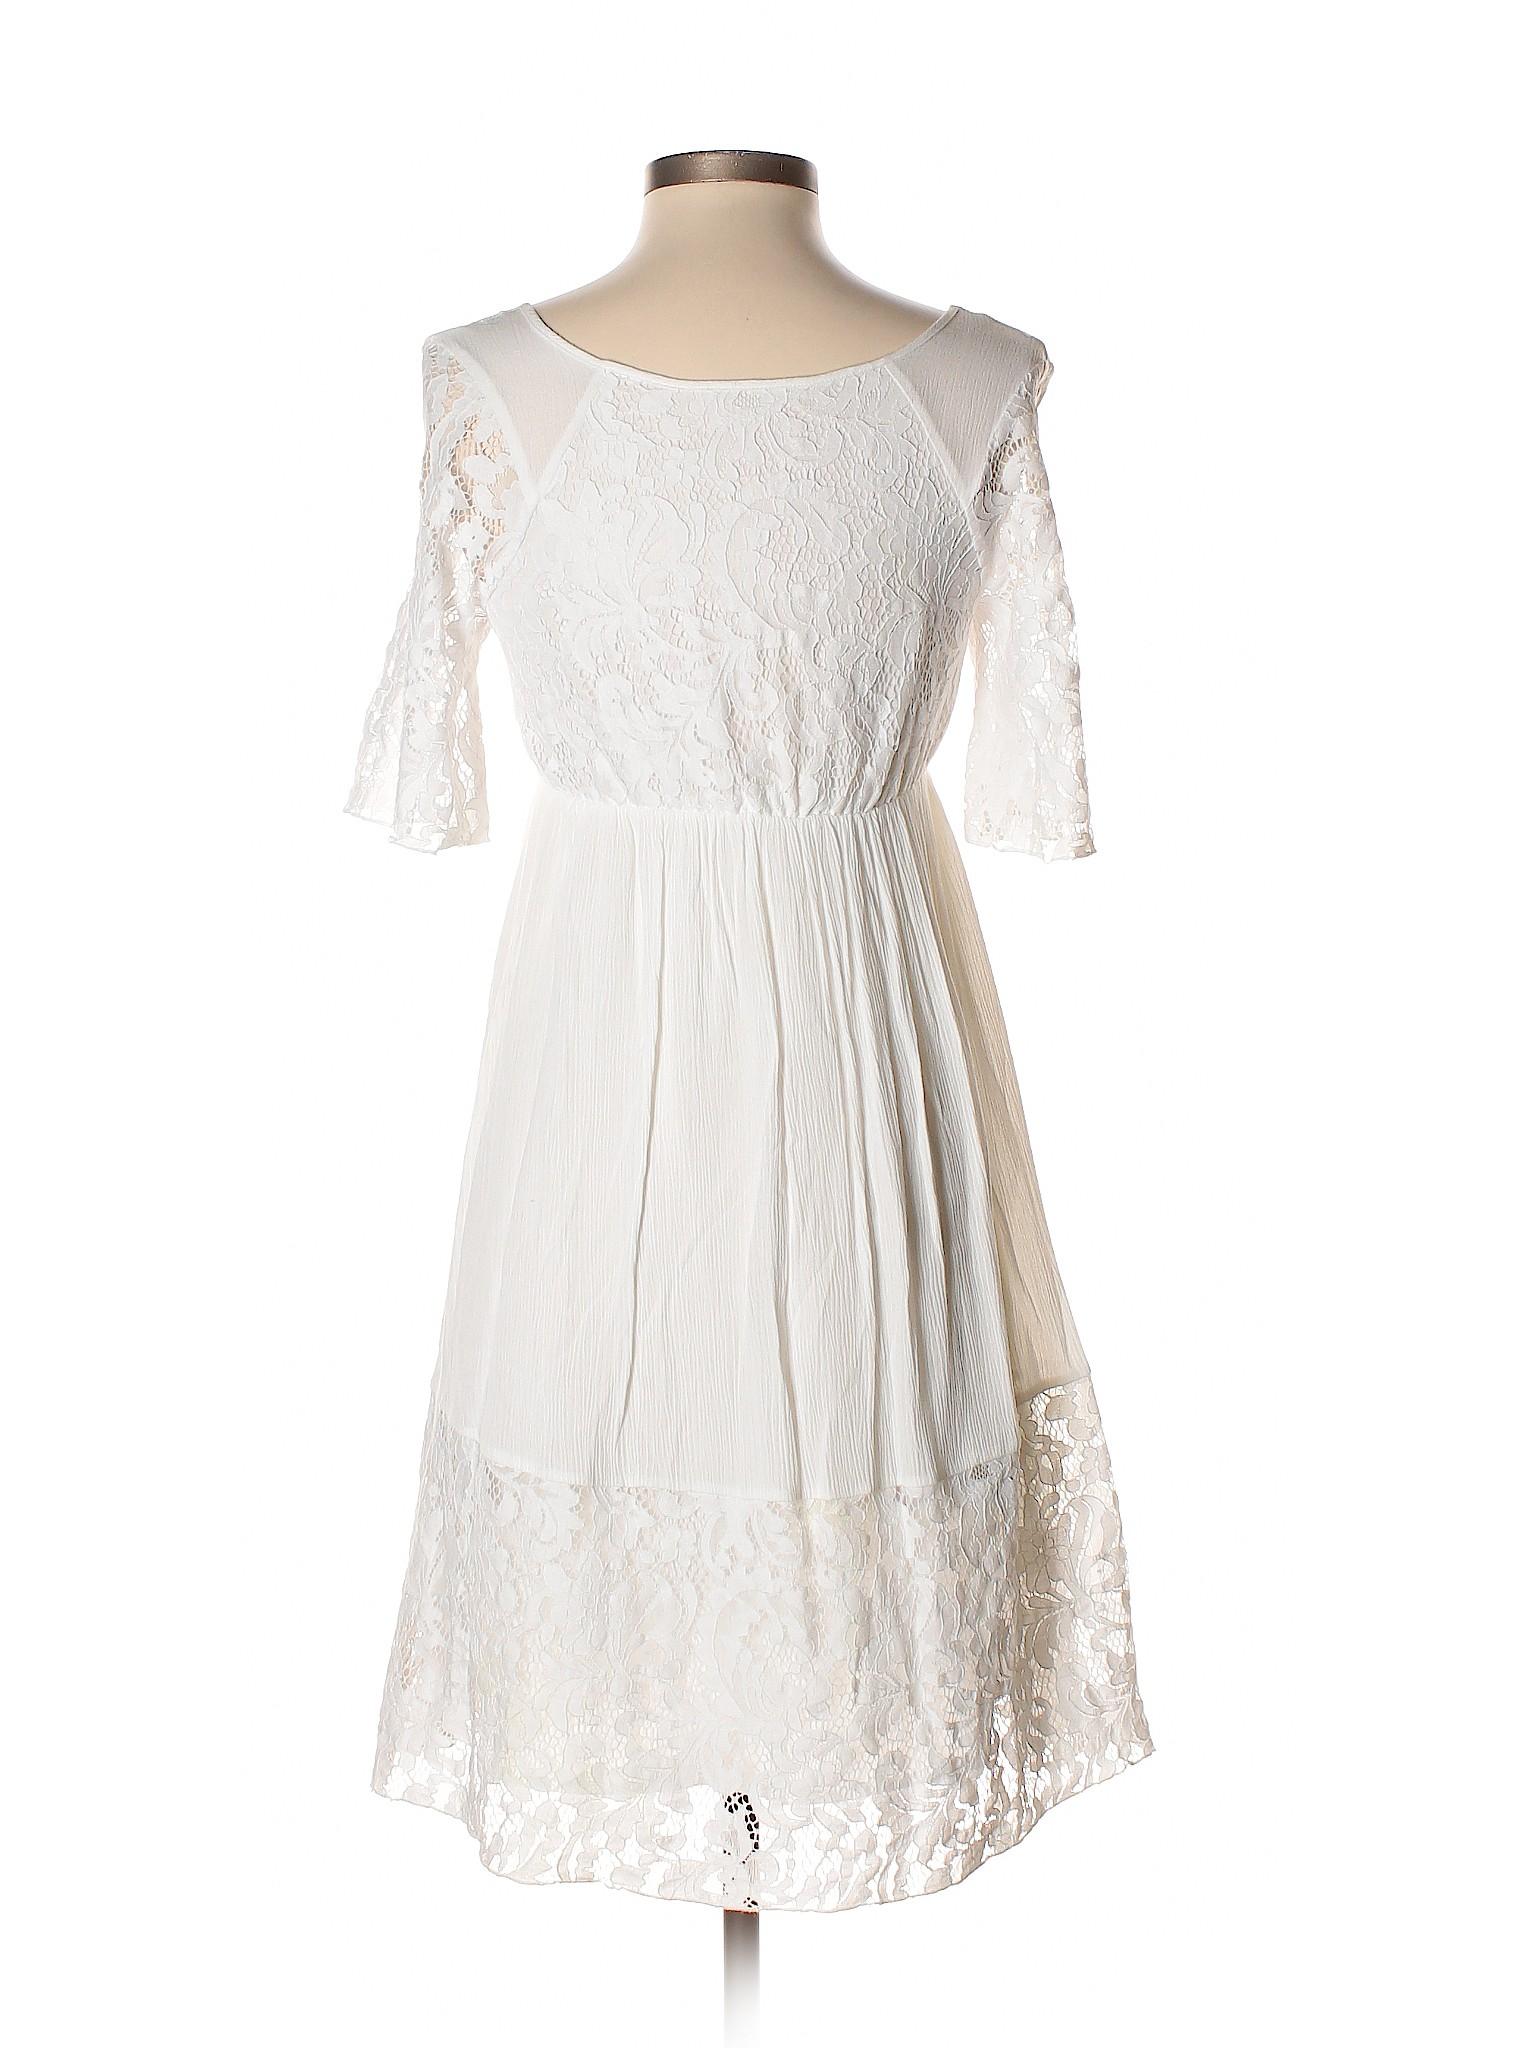 Selling BCBGeneration Dress BCBGeneration Casual Casual Dress Selling Selling BCBGeneration YTSTpwxX4q